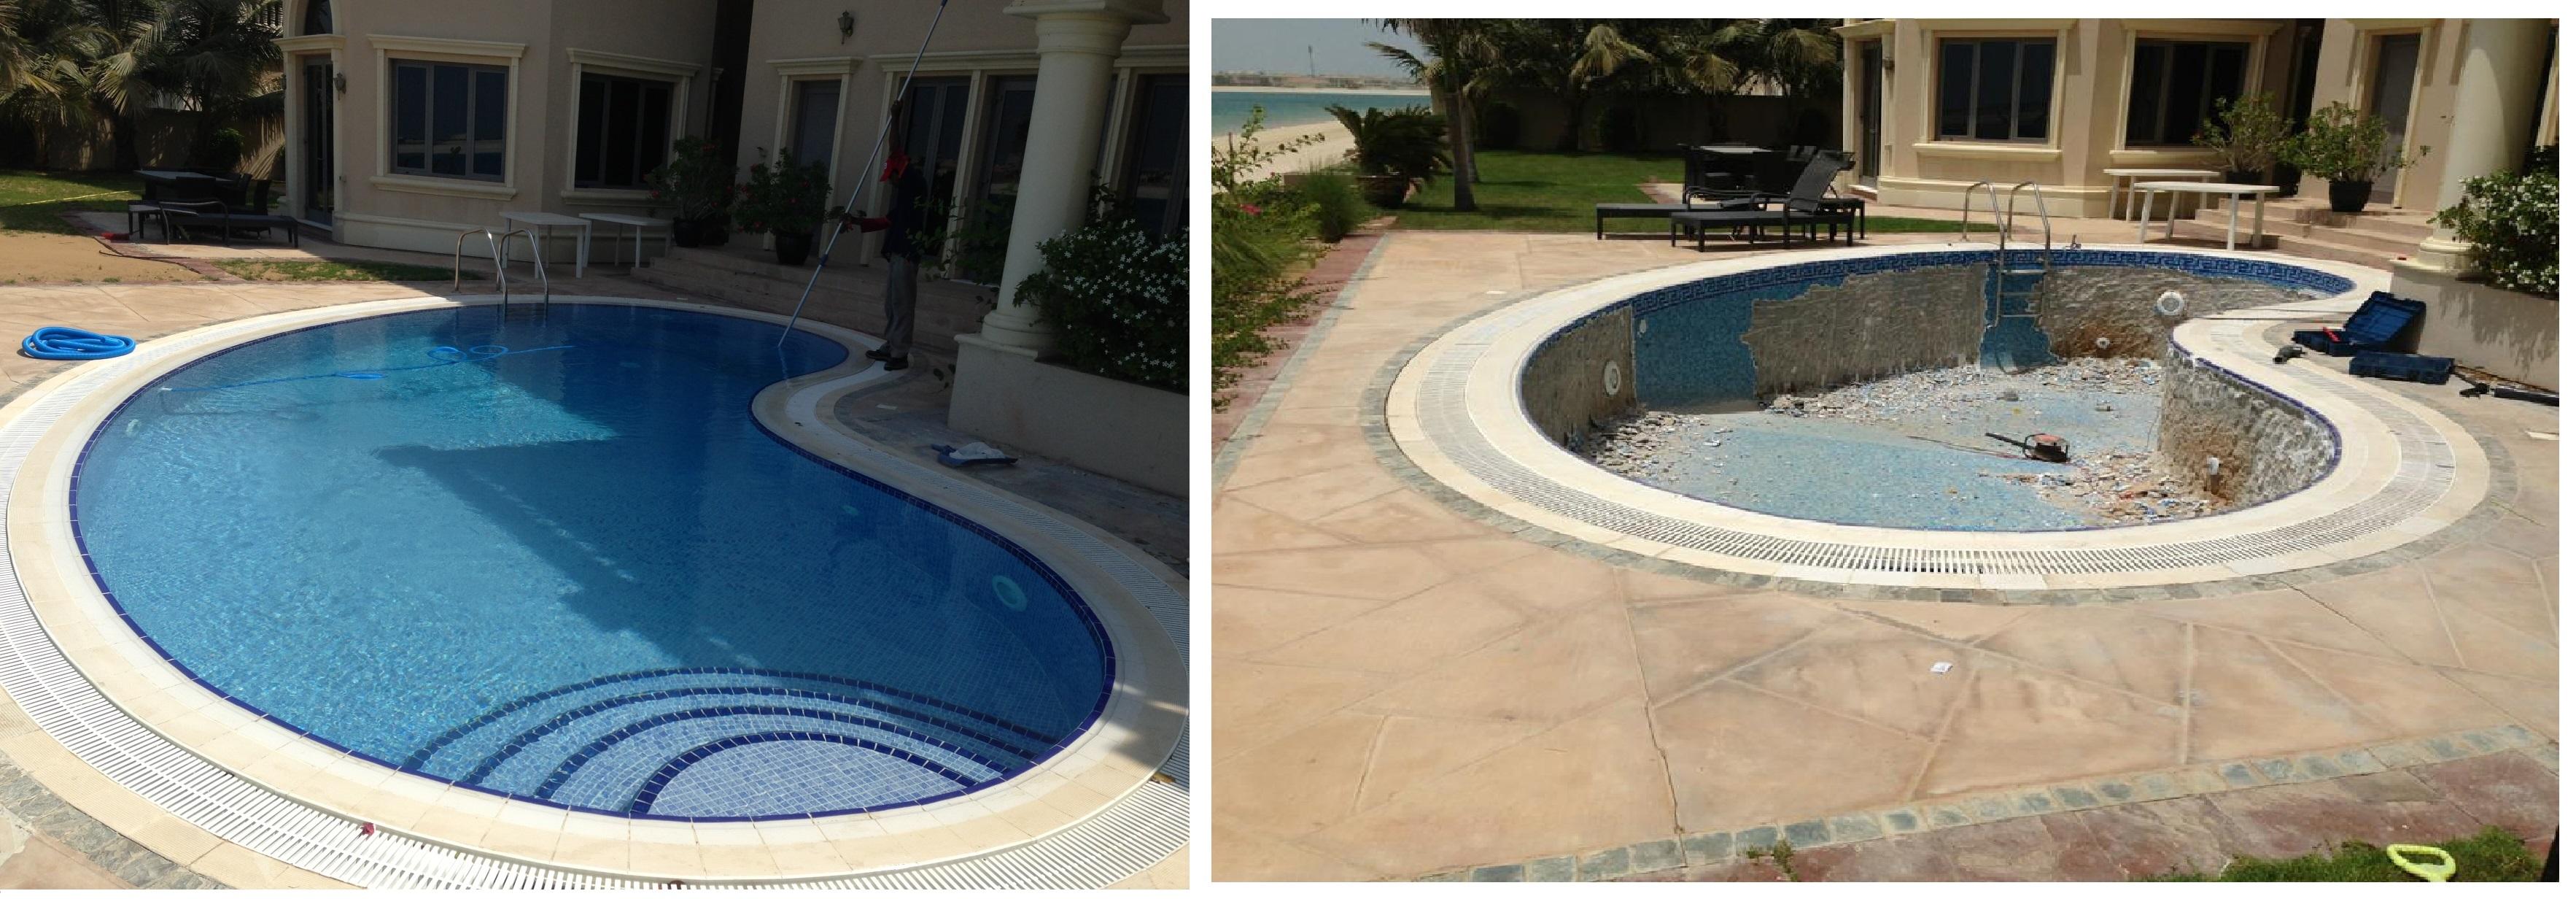 Swimming Pool Cleaning Maintenance Dubai